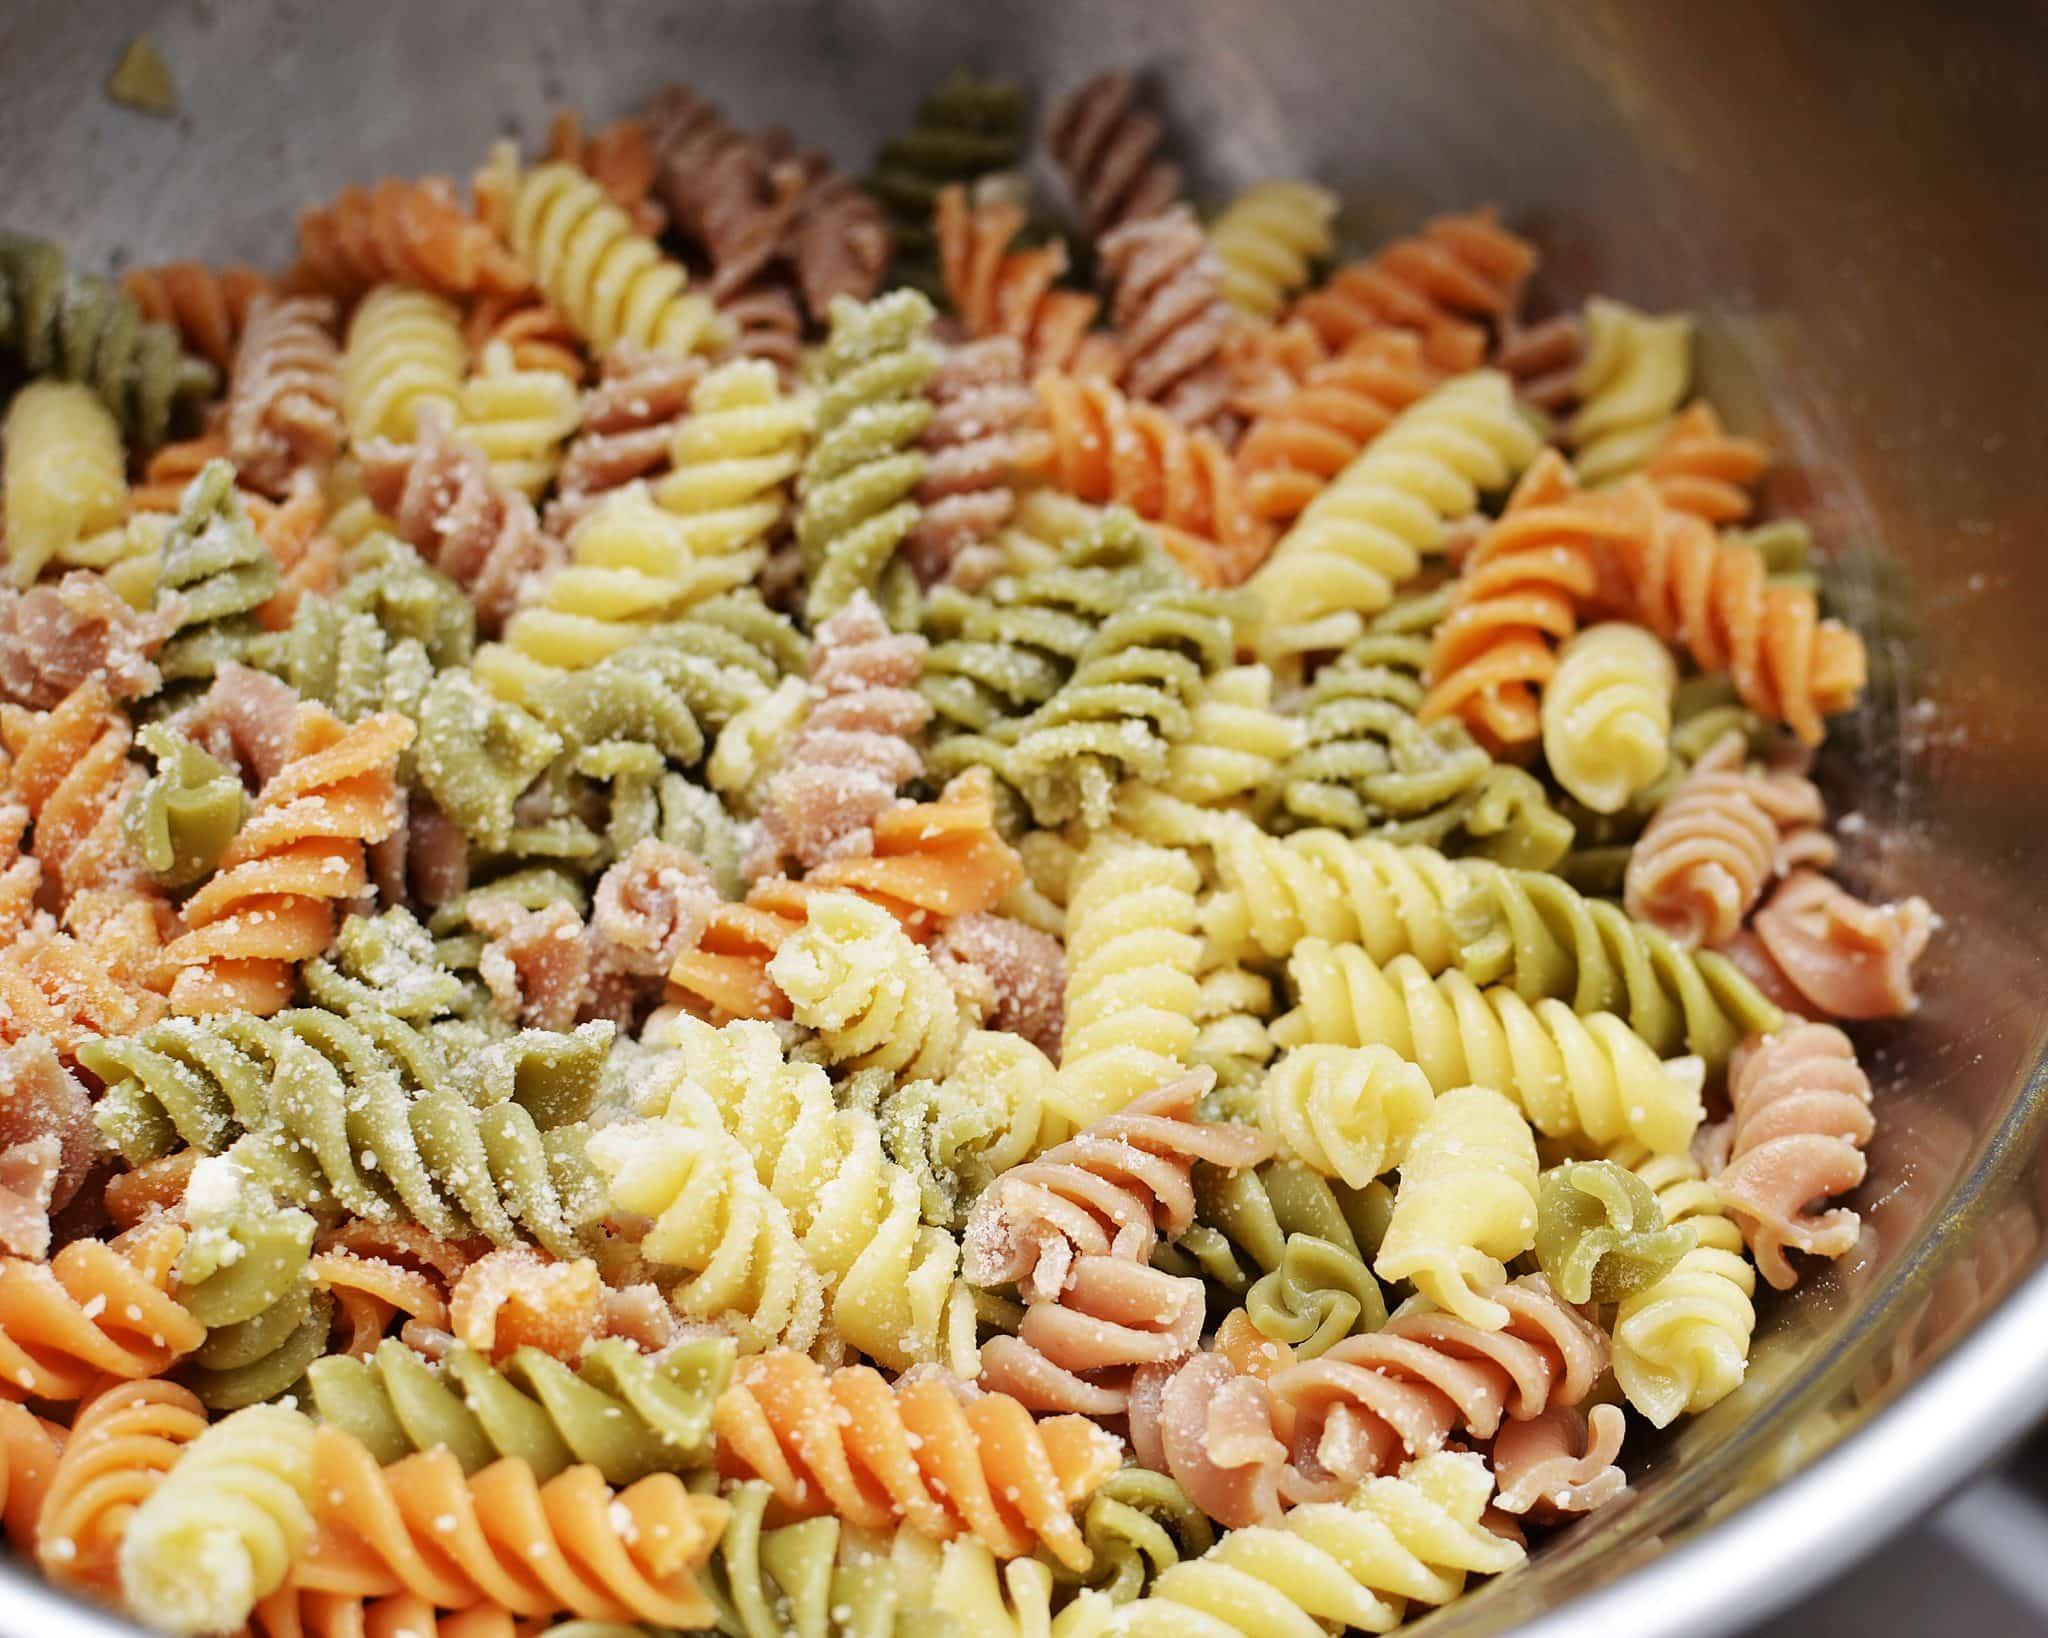 Rotini Pasta Salad With Italian Dressing